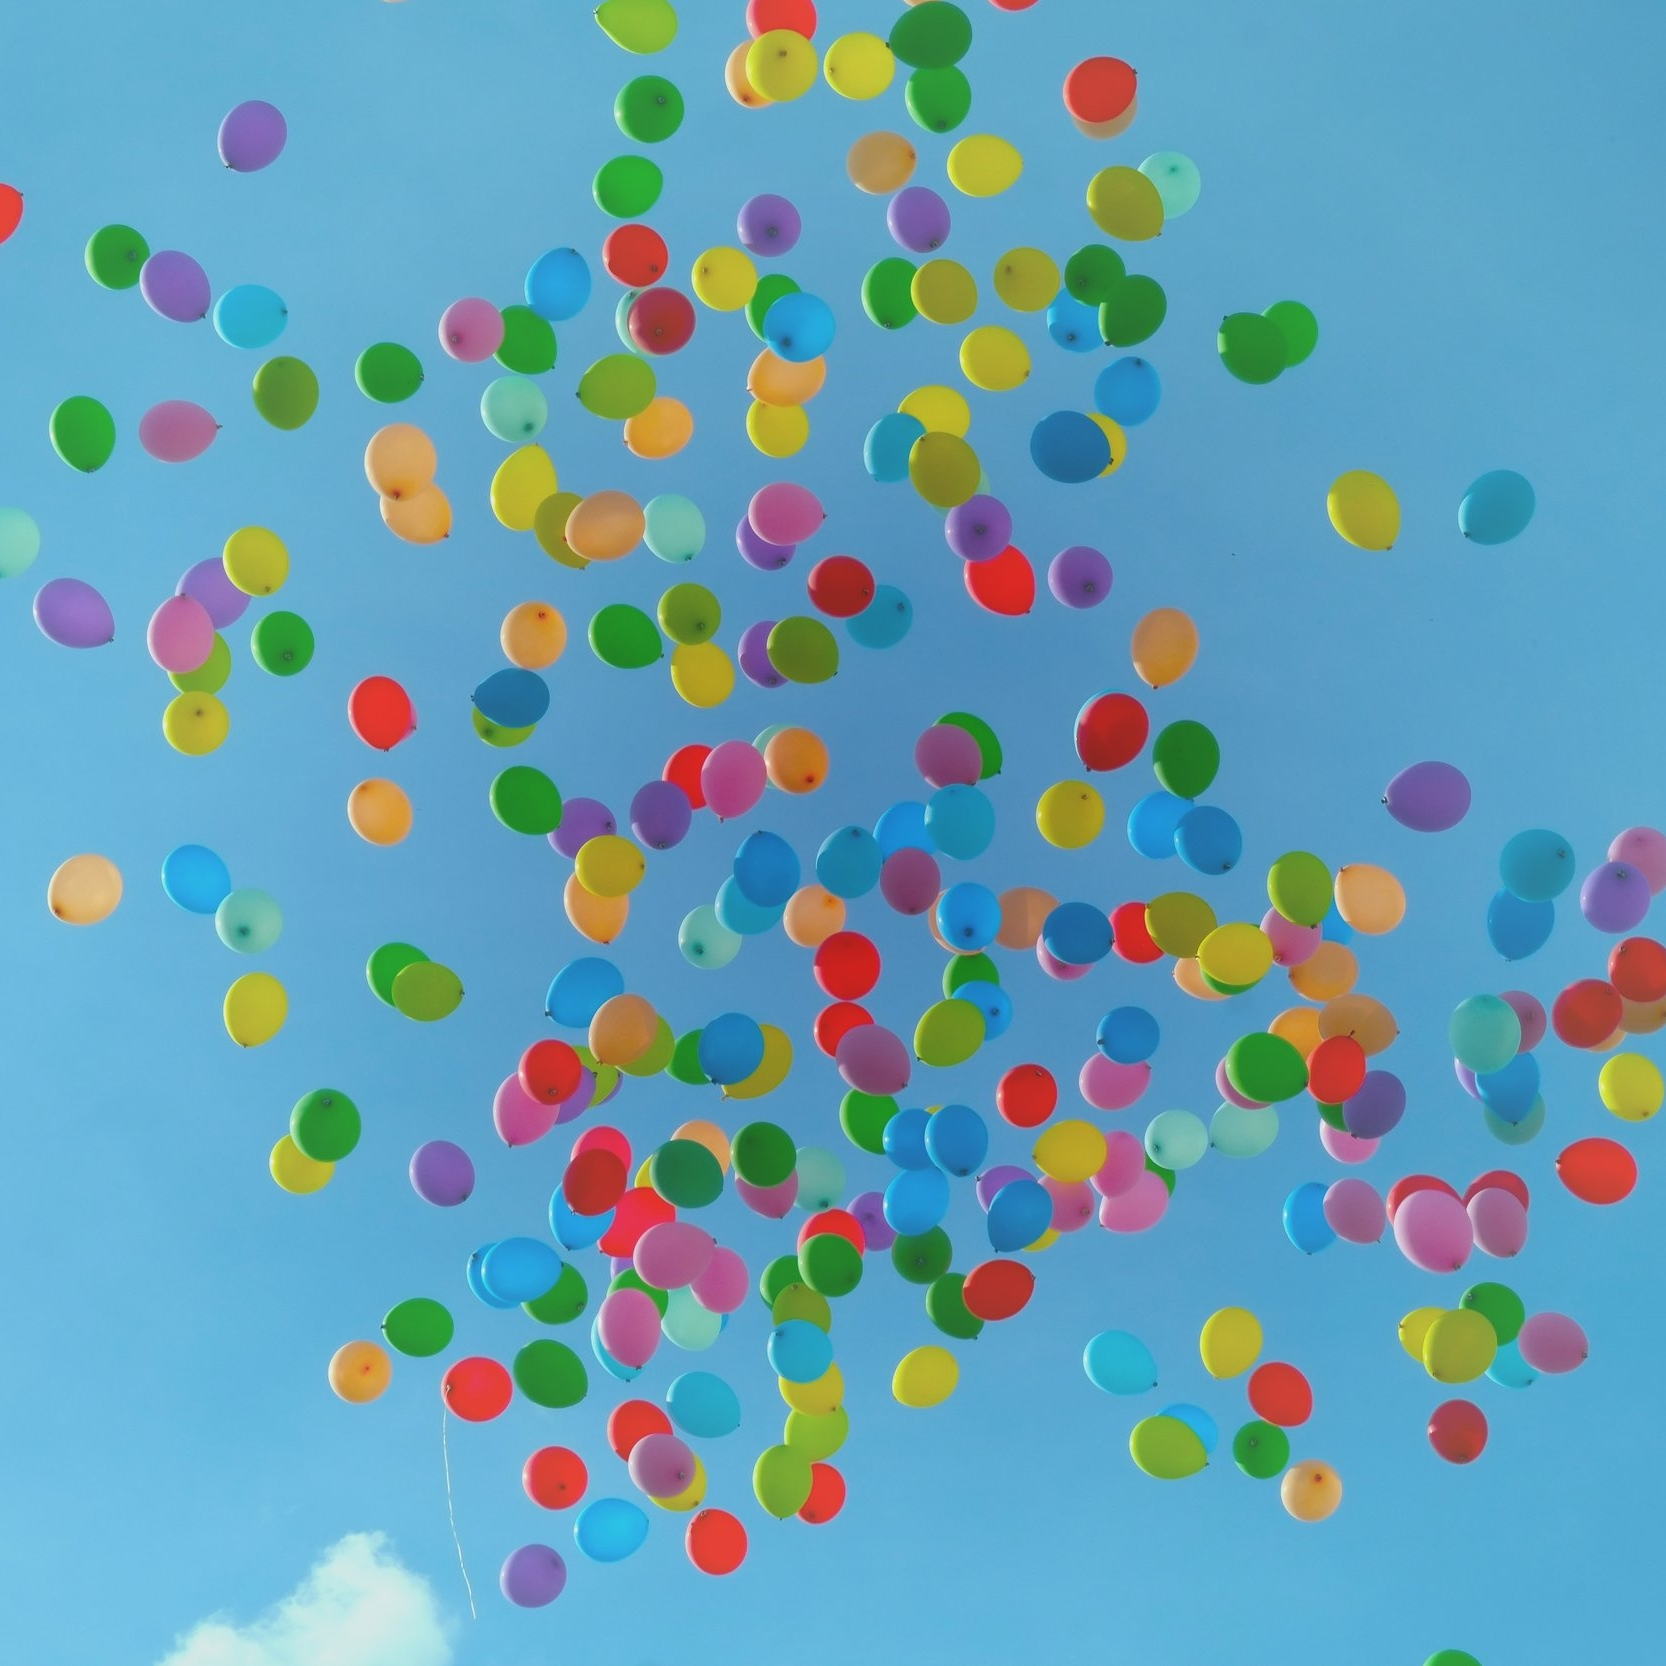 Balloons in the sky.jpg